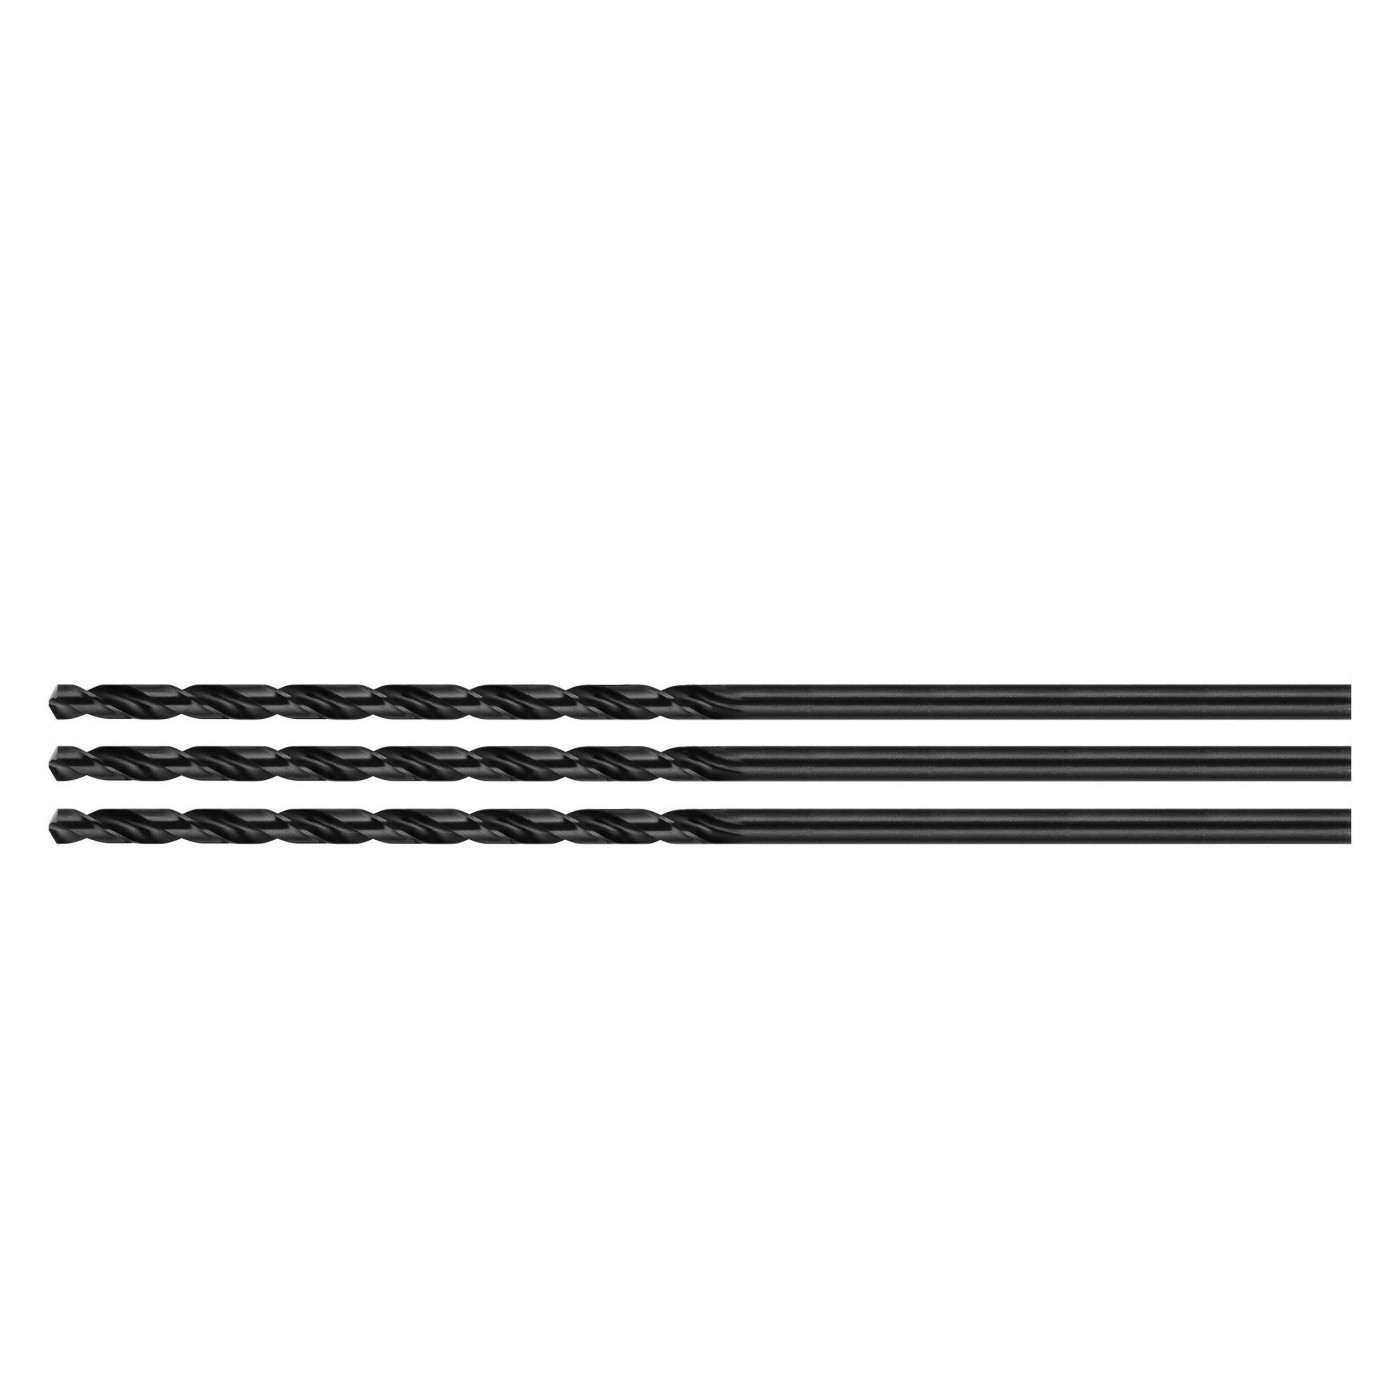 Set of 3 metal drill bits, extra long (6.0x300 mm)